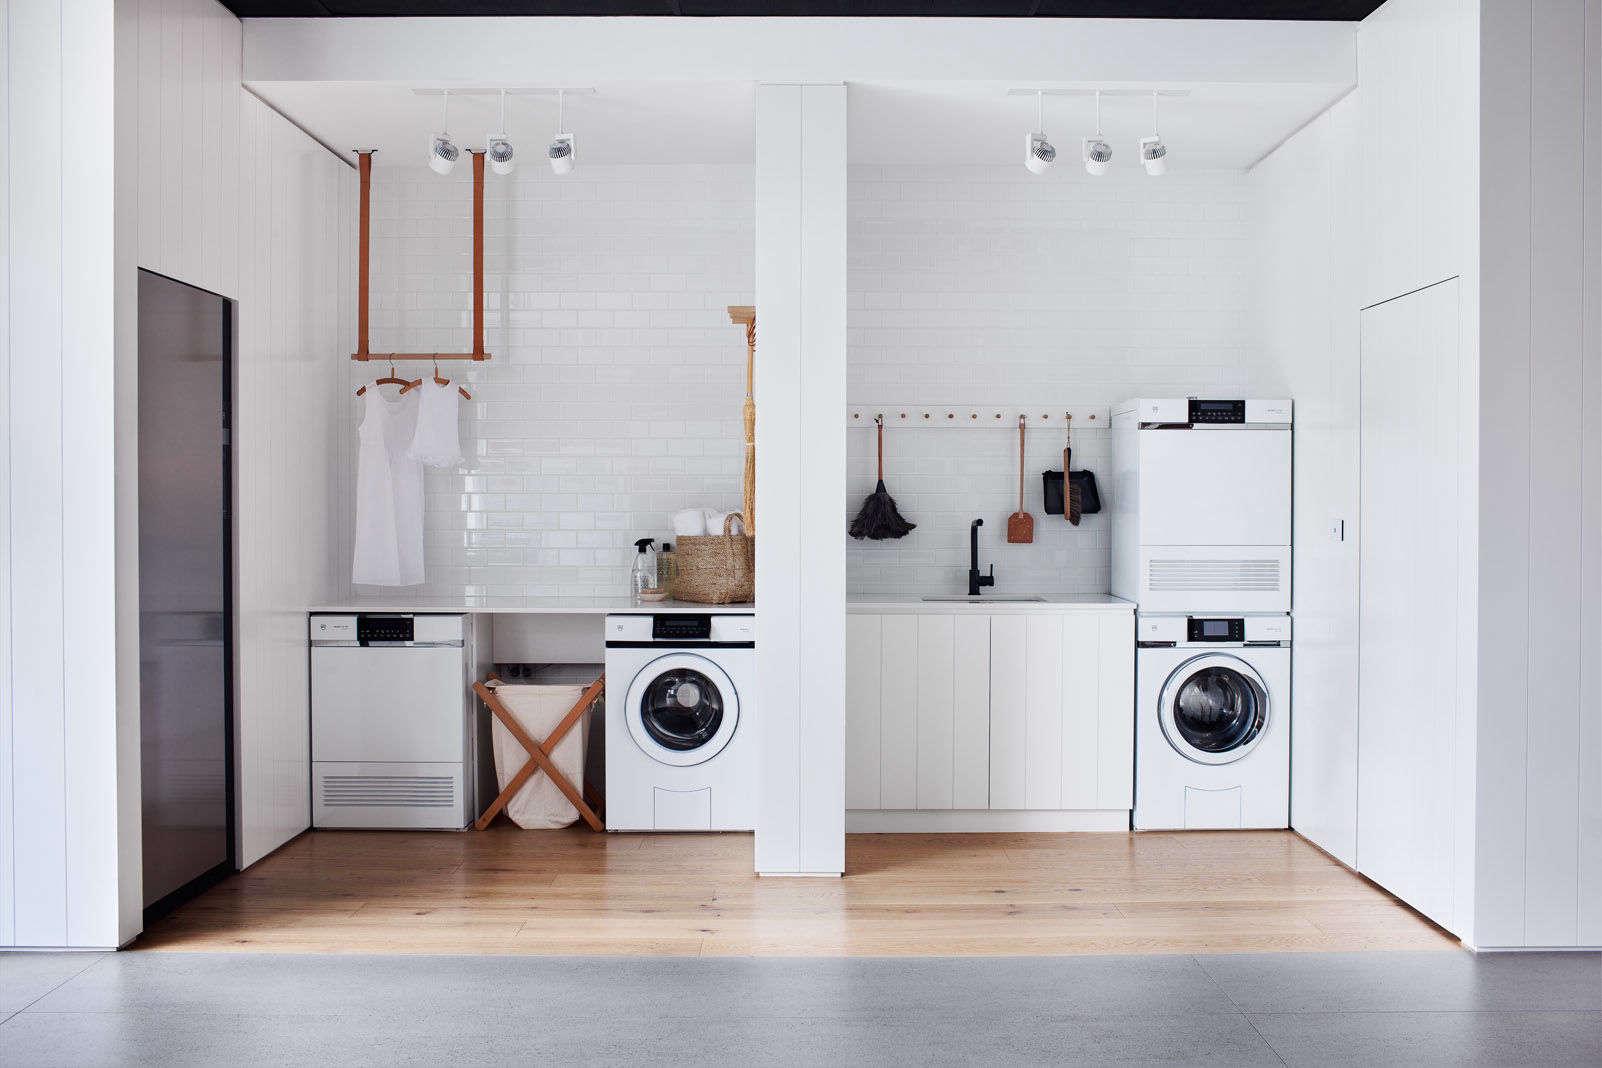 V-ZUG Whitling Architects Melbourne, Australia Laundry Room